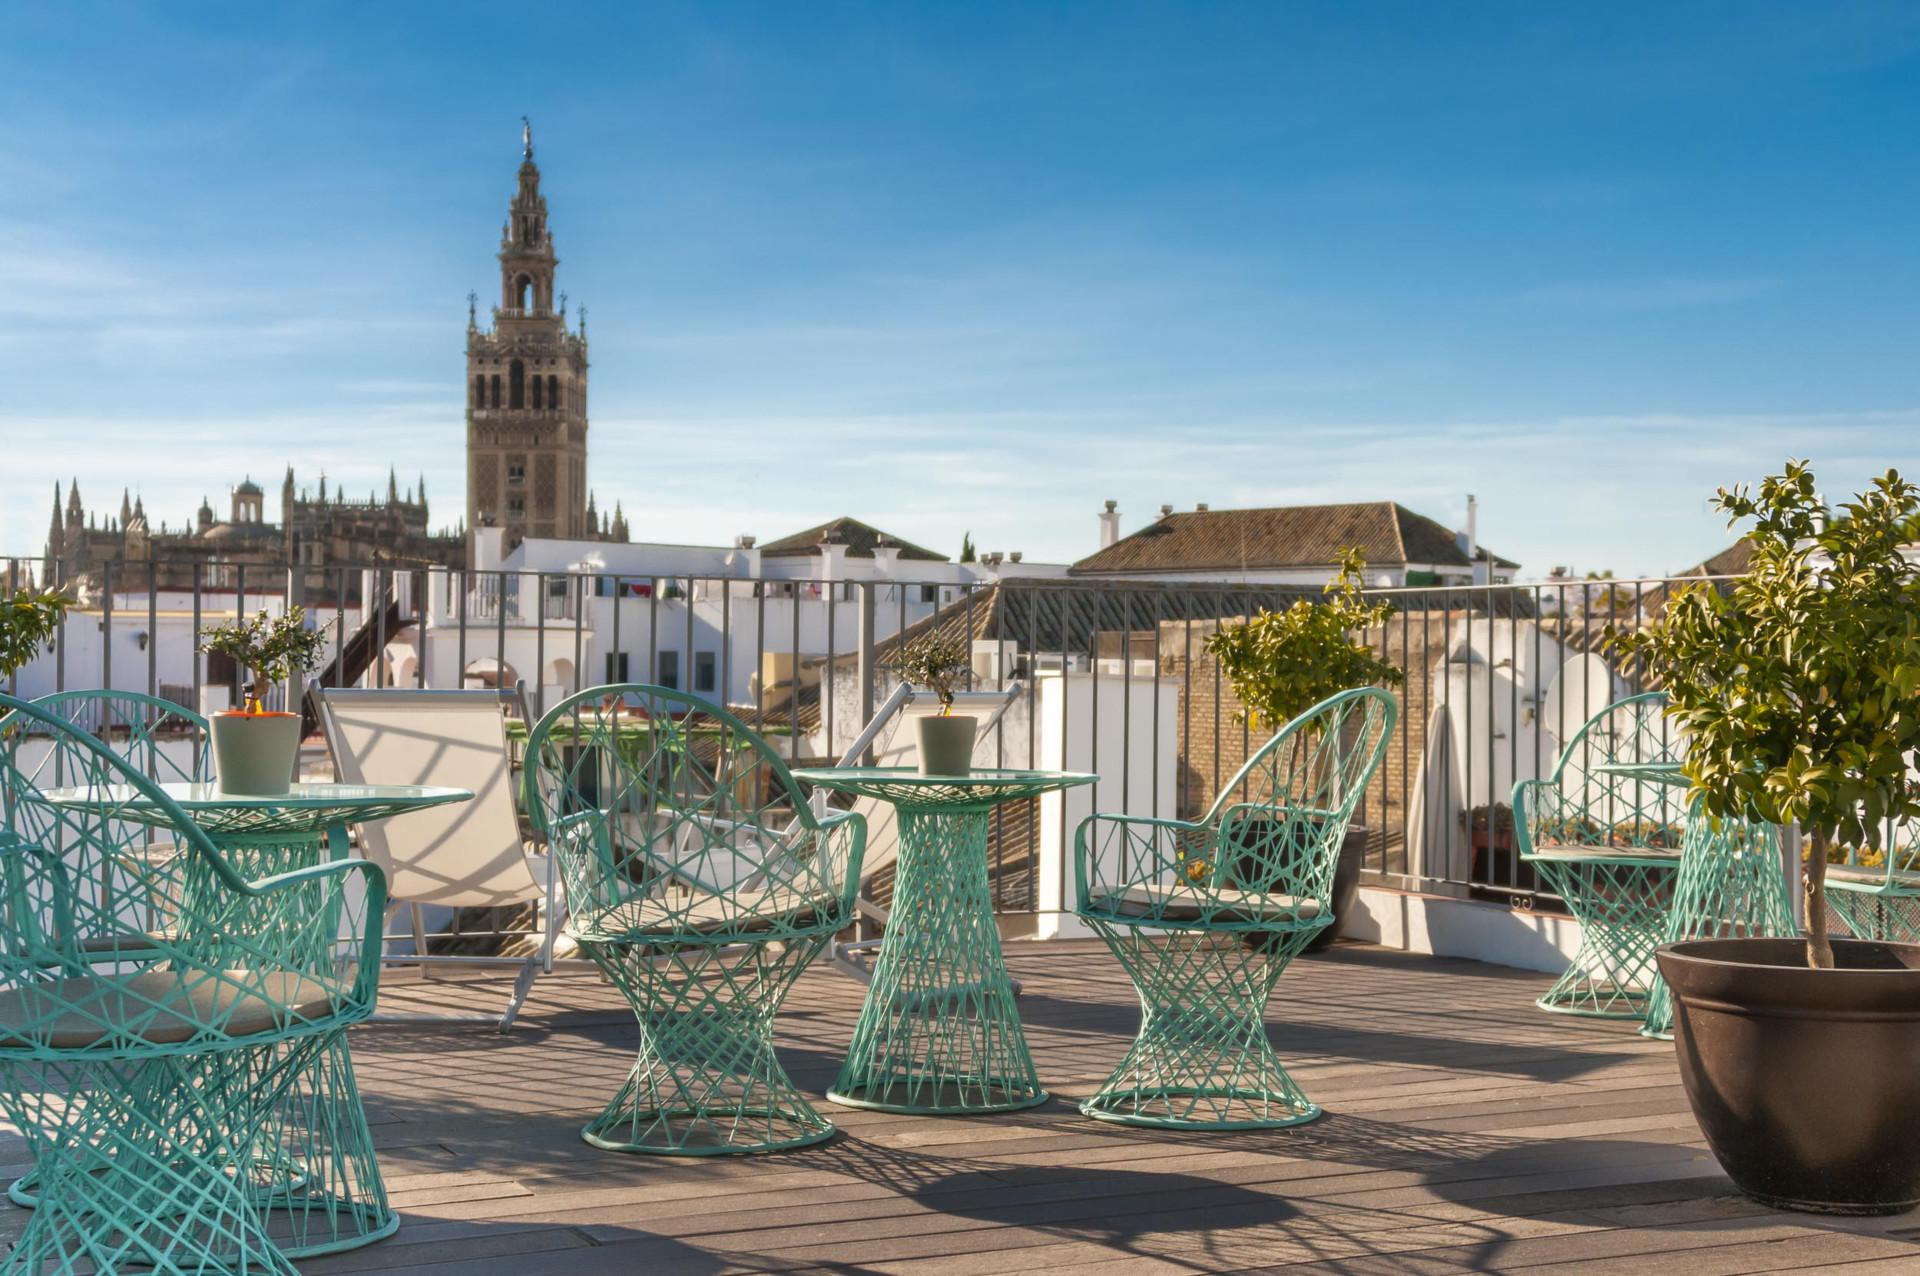 Hotel amadeus seville luxury hotel spain original travel for Hotels seville